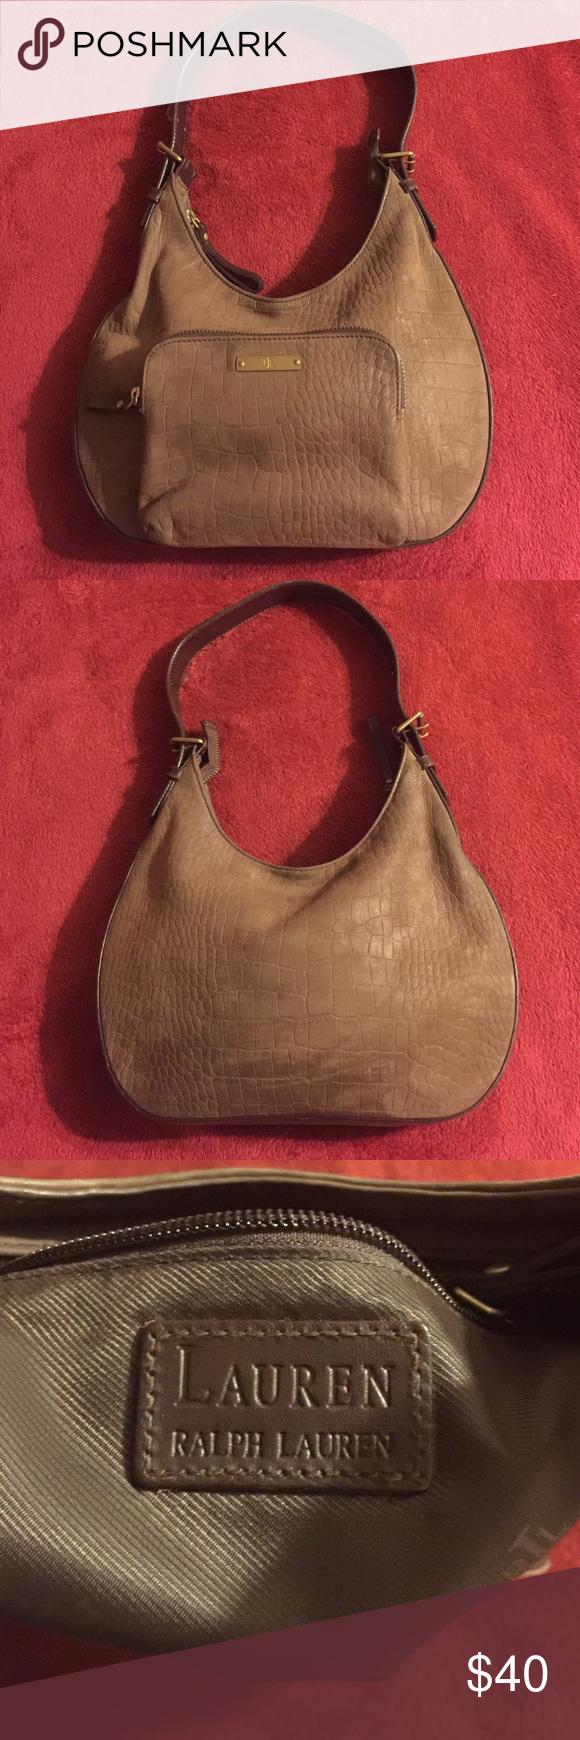 0f54cebc671 Ralph Lauren Croc Bag - SIS Solutions